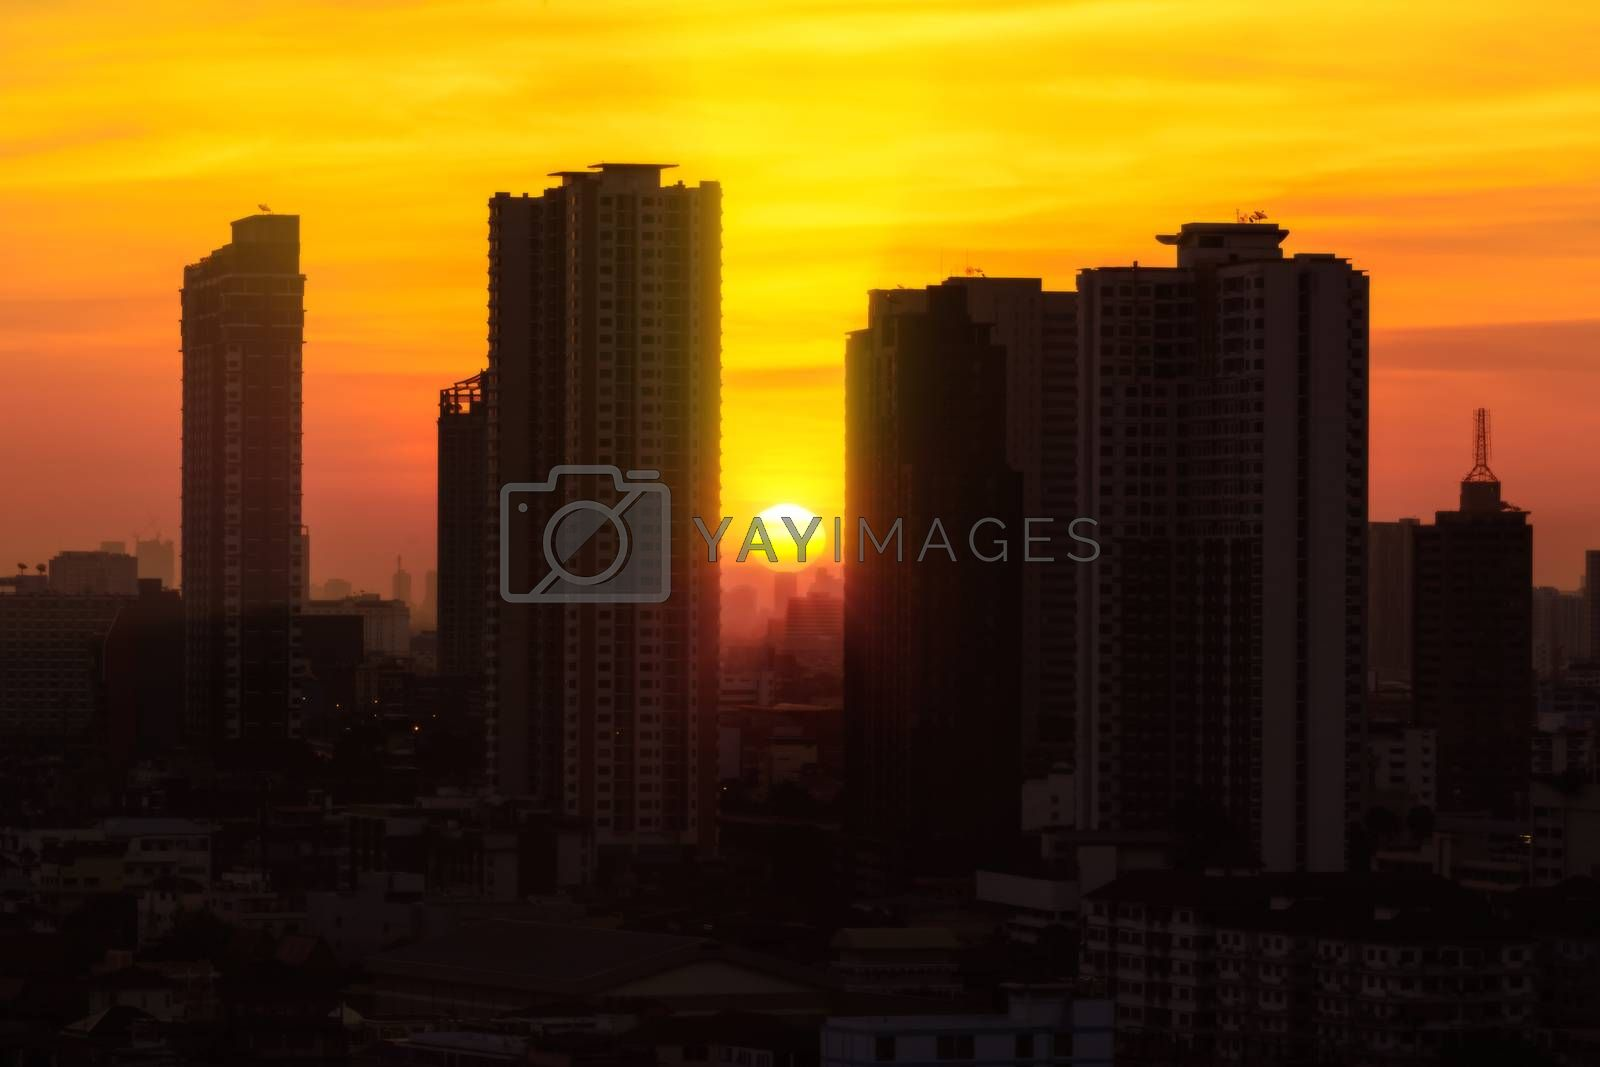 The siluate cityscape photography plus orton Effect